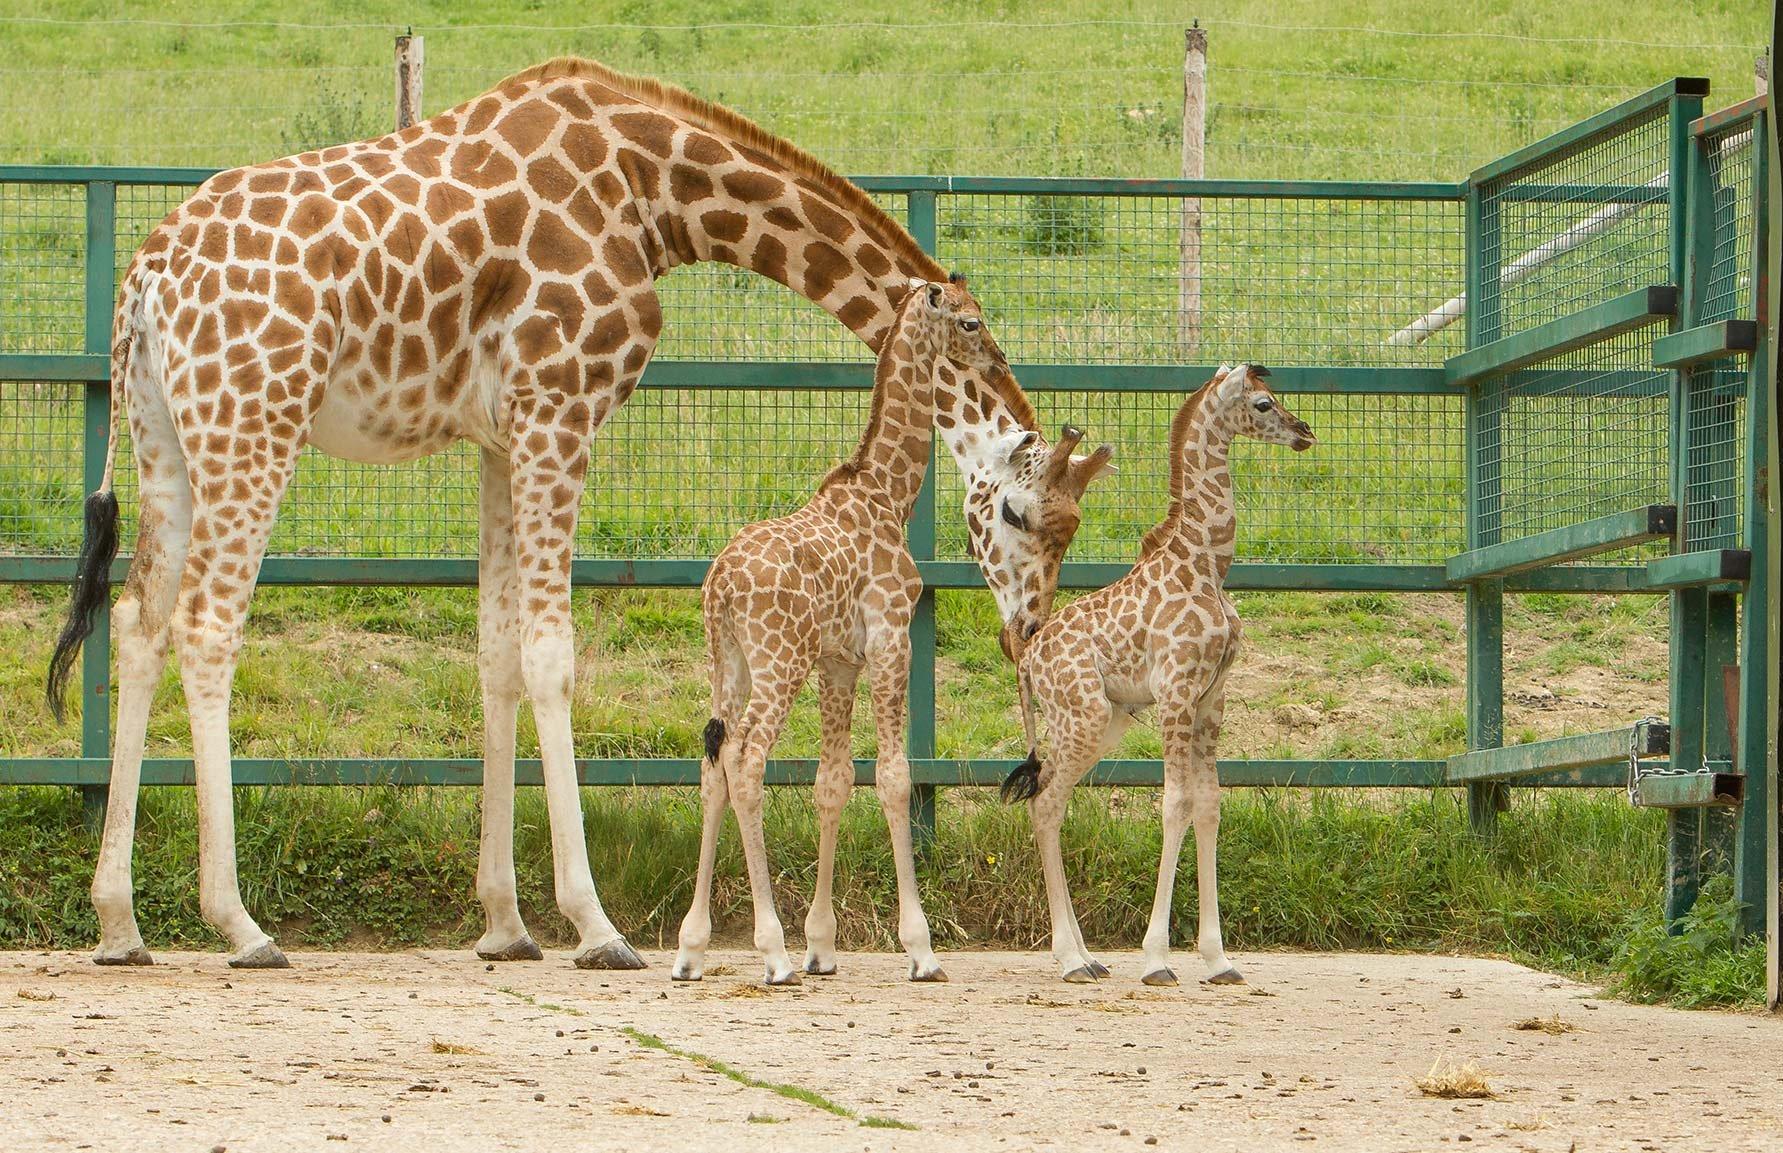 Giraffe calves at Port Lympne Hotel & Reserve Kent